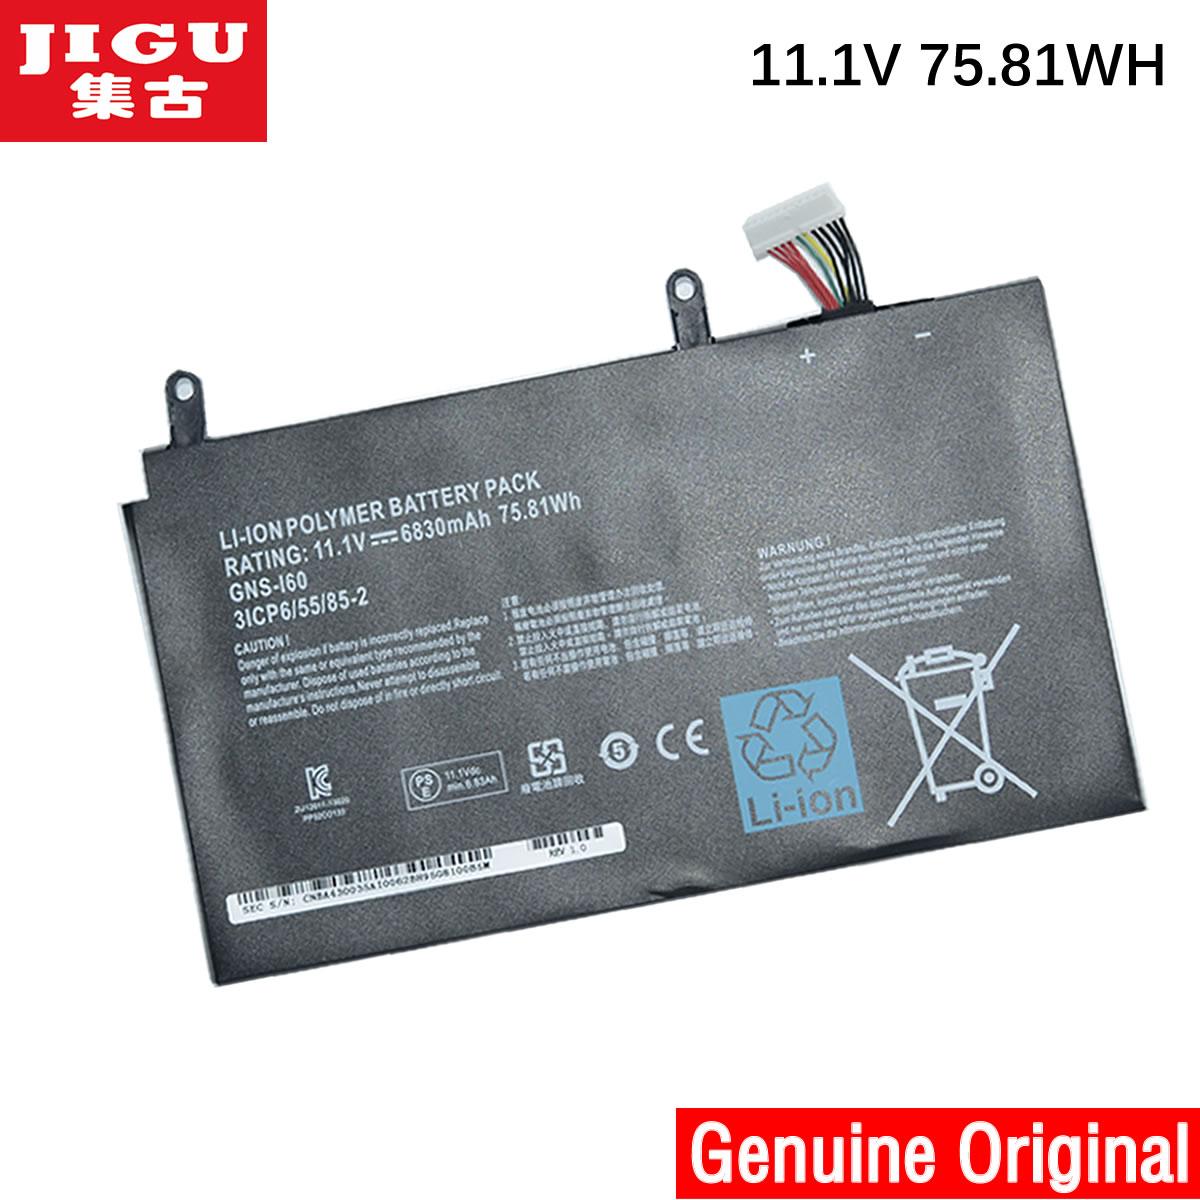 JIGU Original Laptop Battery 961TA010FA GNS-160 GNS-I60 FOR GIGABYTE P35G V2  P35X V3 P37X V5 P57W P57X V6 P35K P35W V2